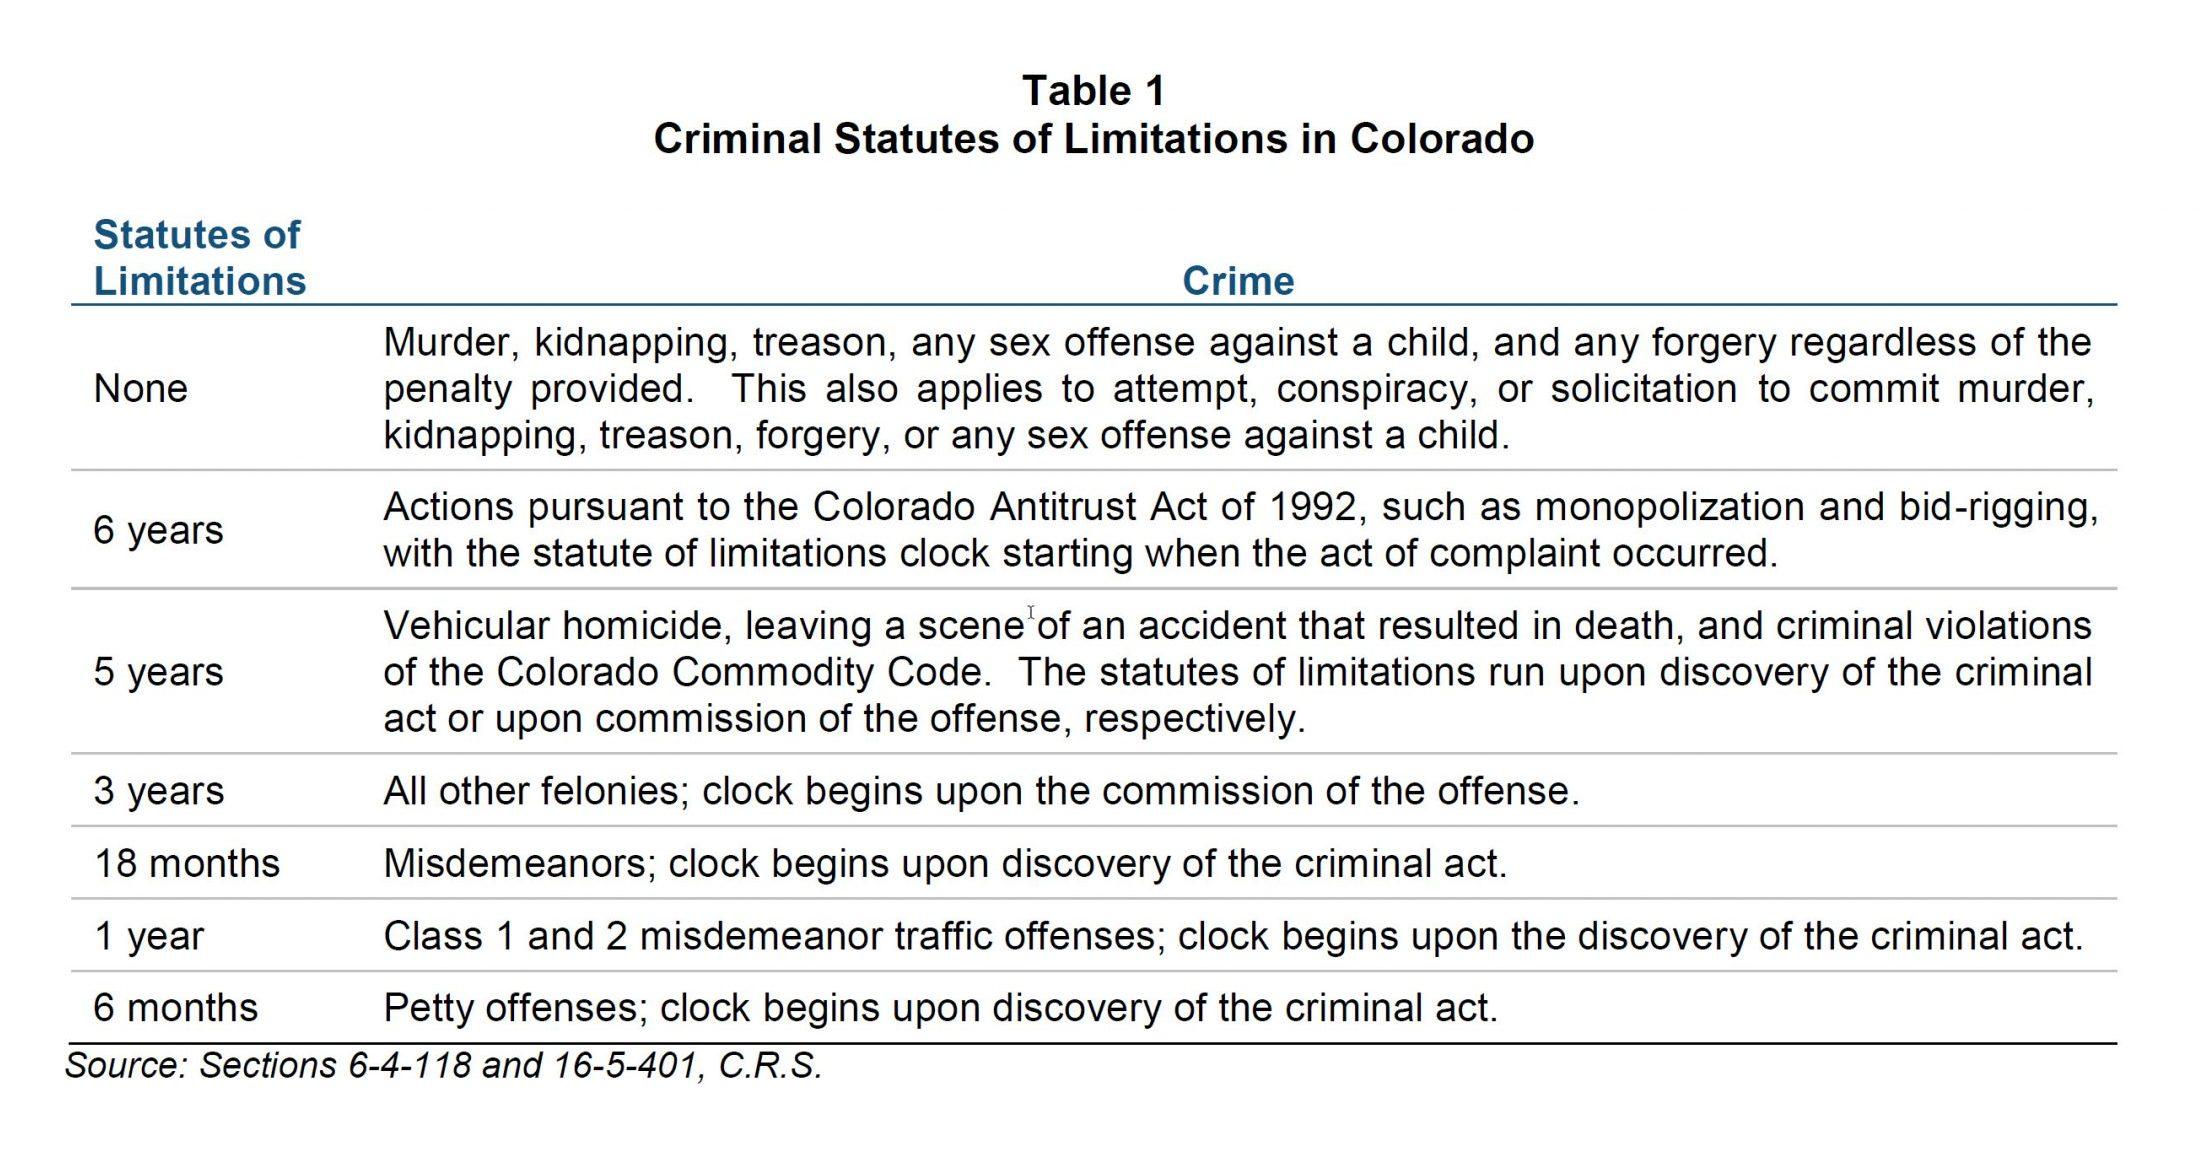 The Colorado Statute of Limitations